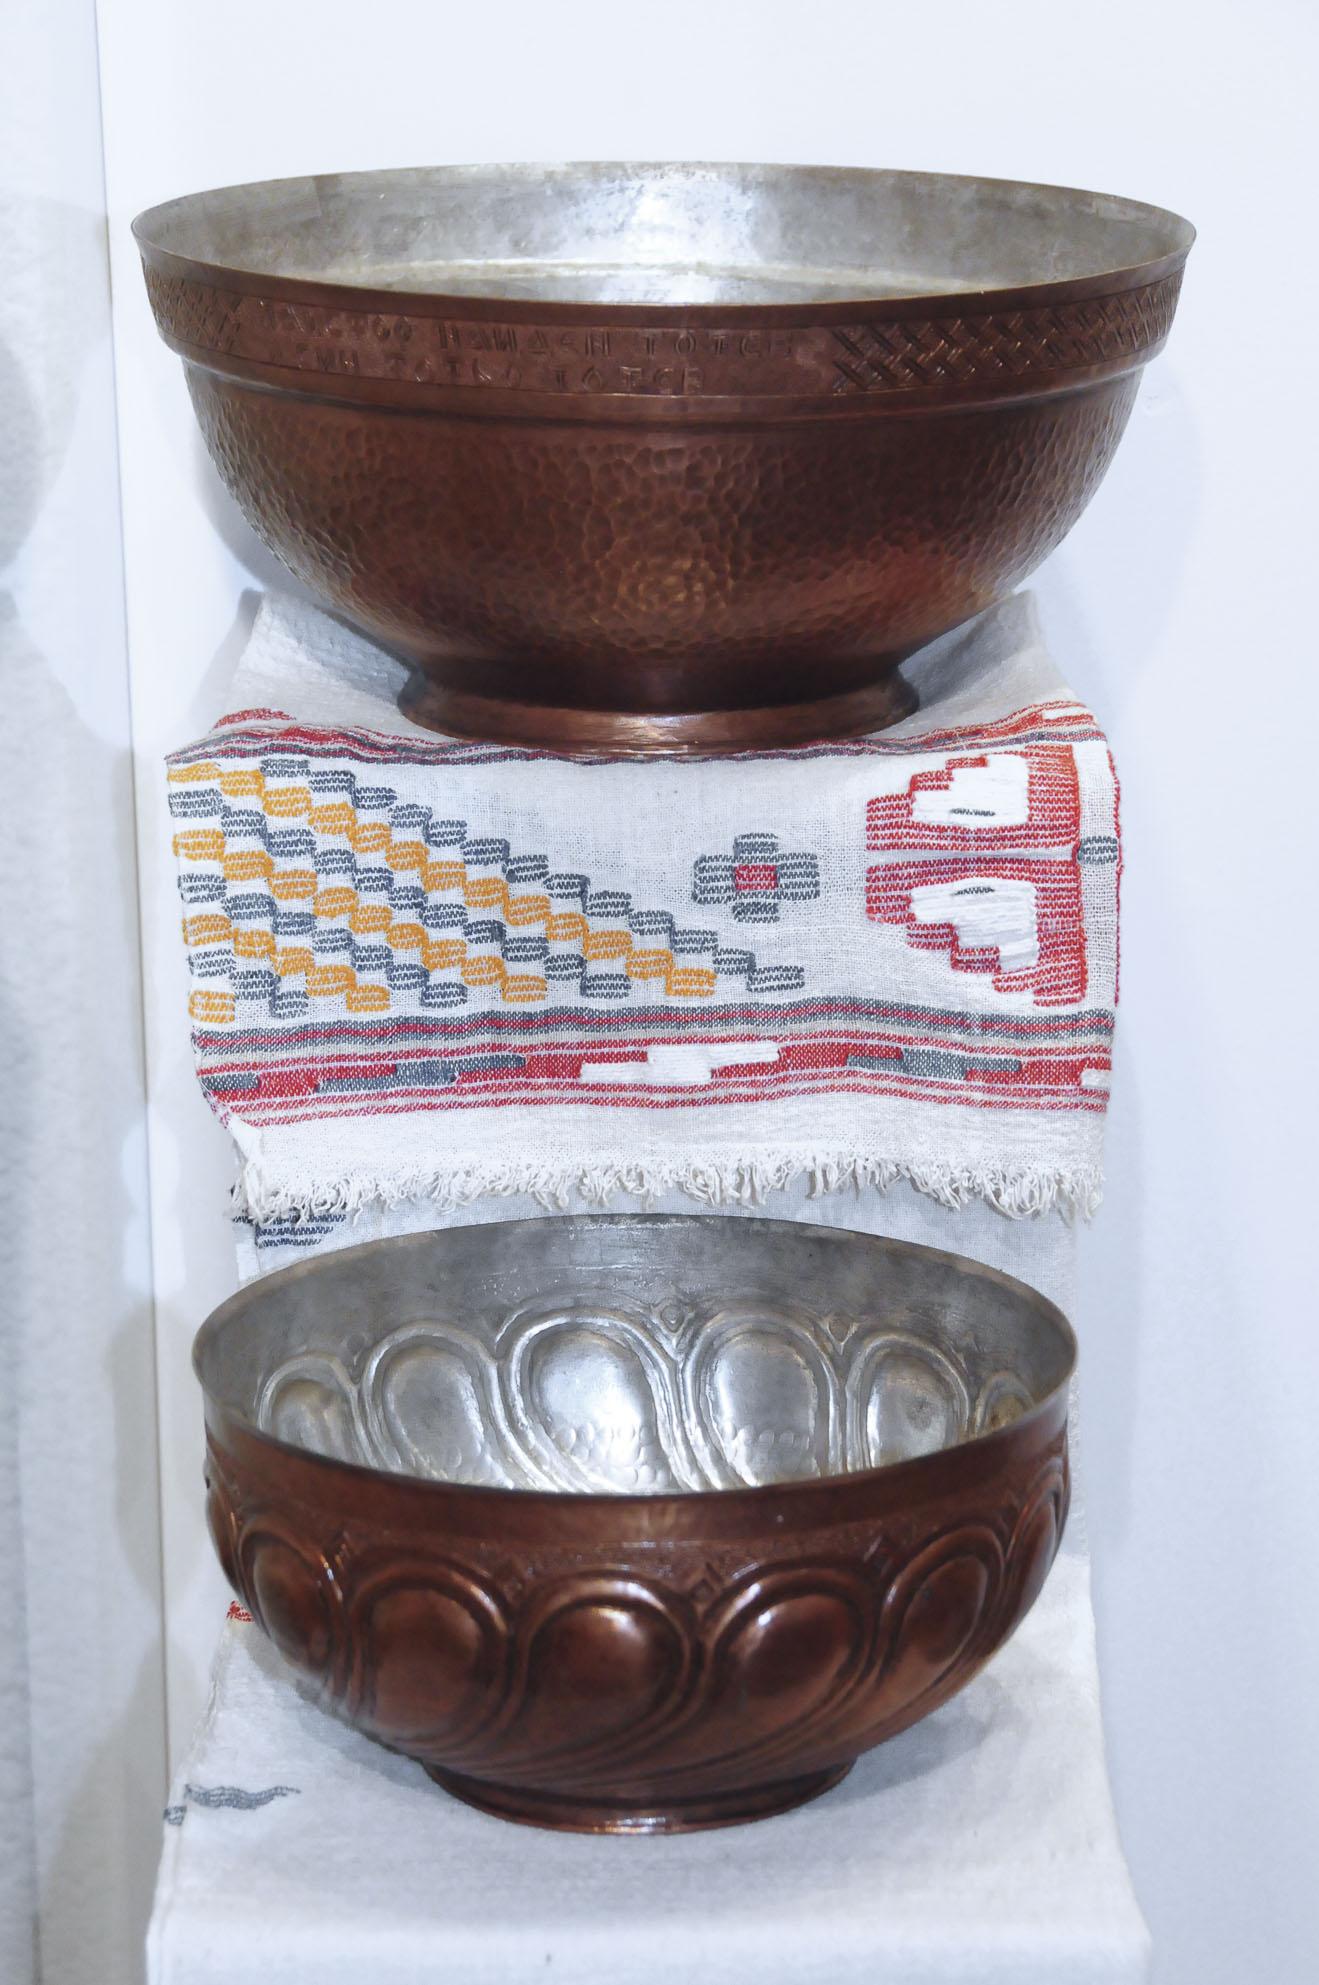 troyan-museum-mednikarstvo-ot-troyanskiq-krai-14